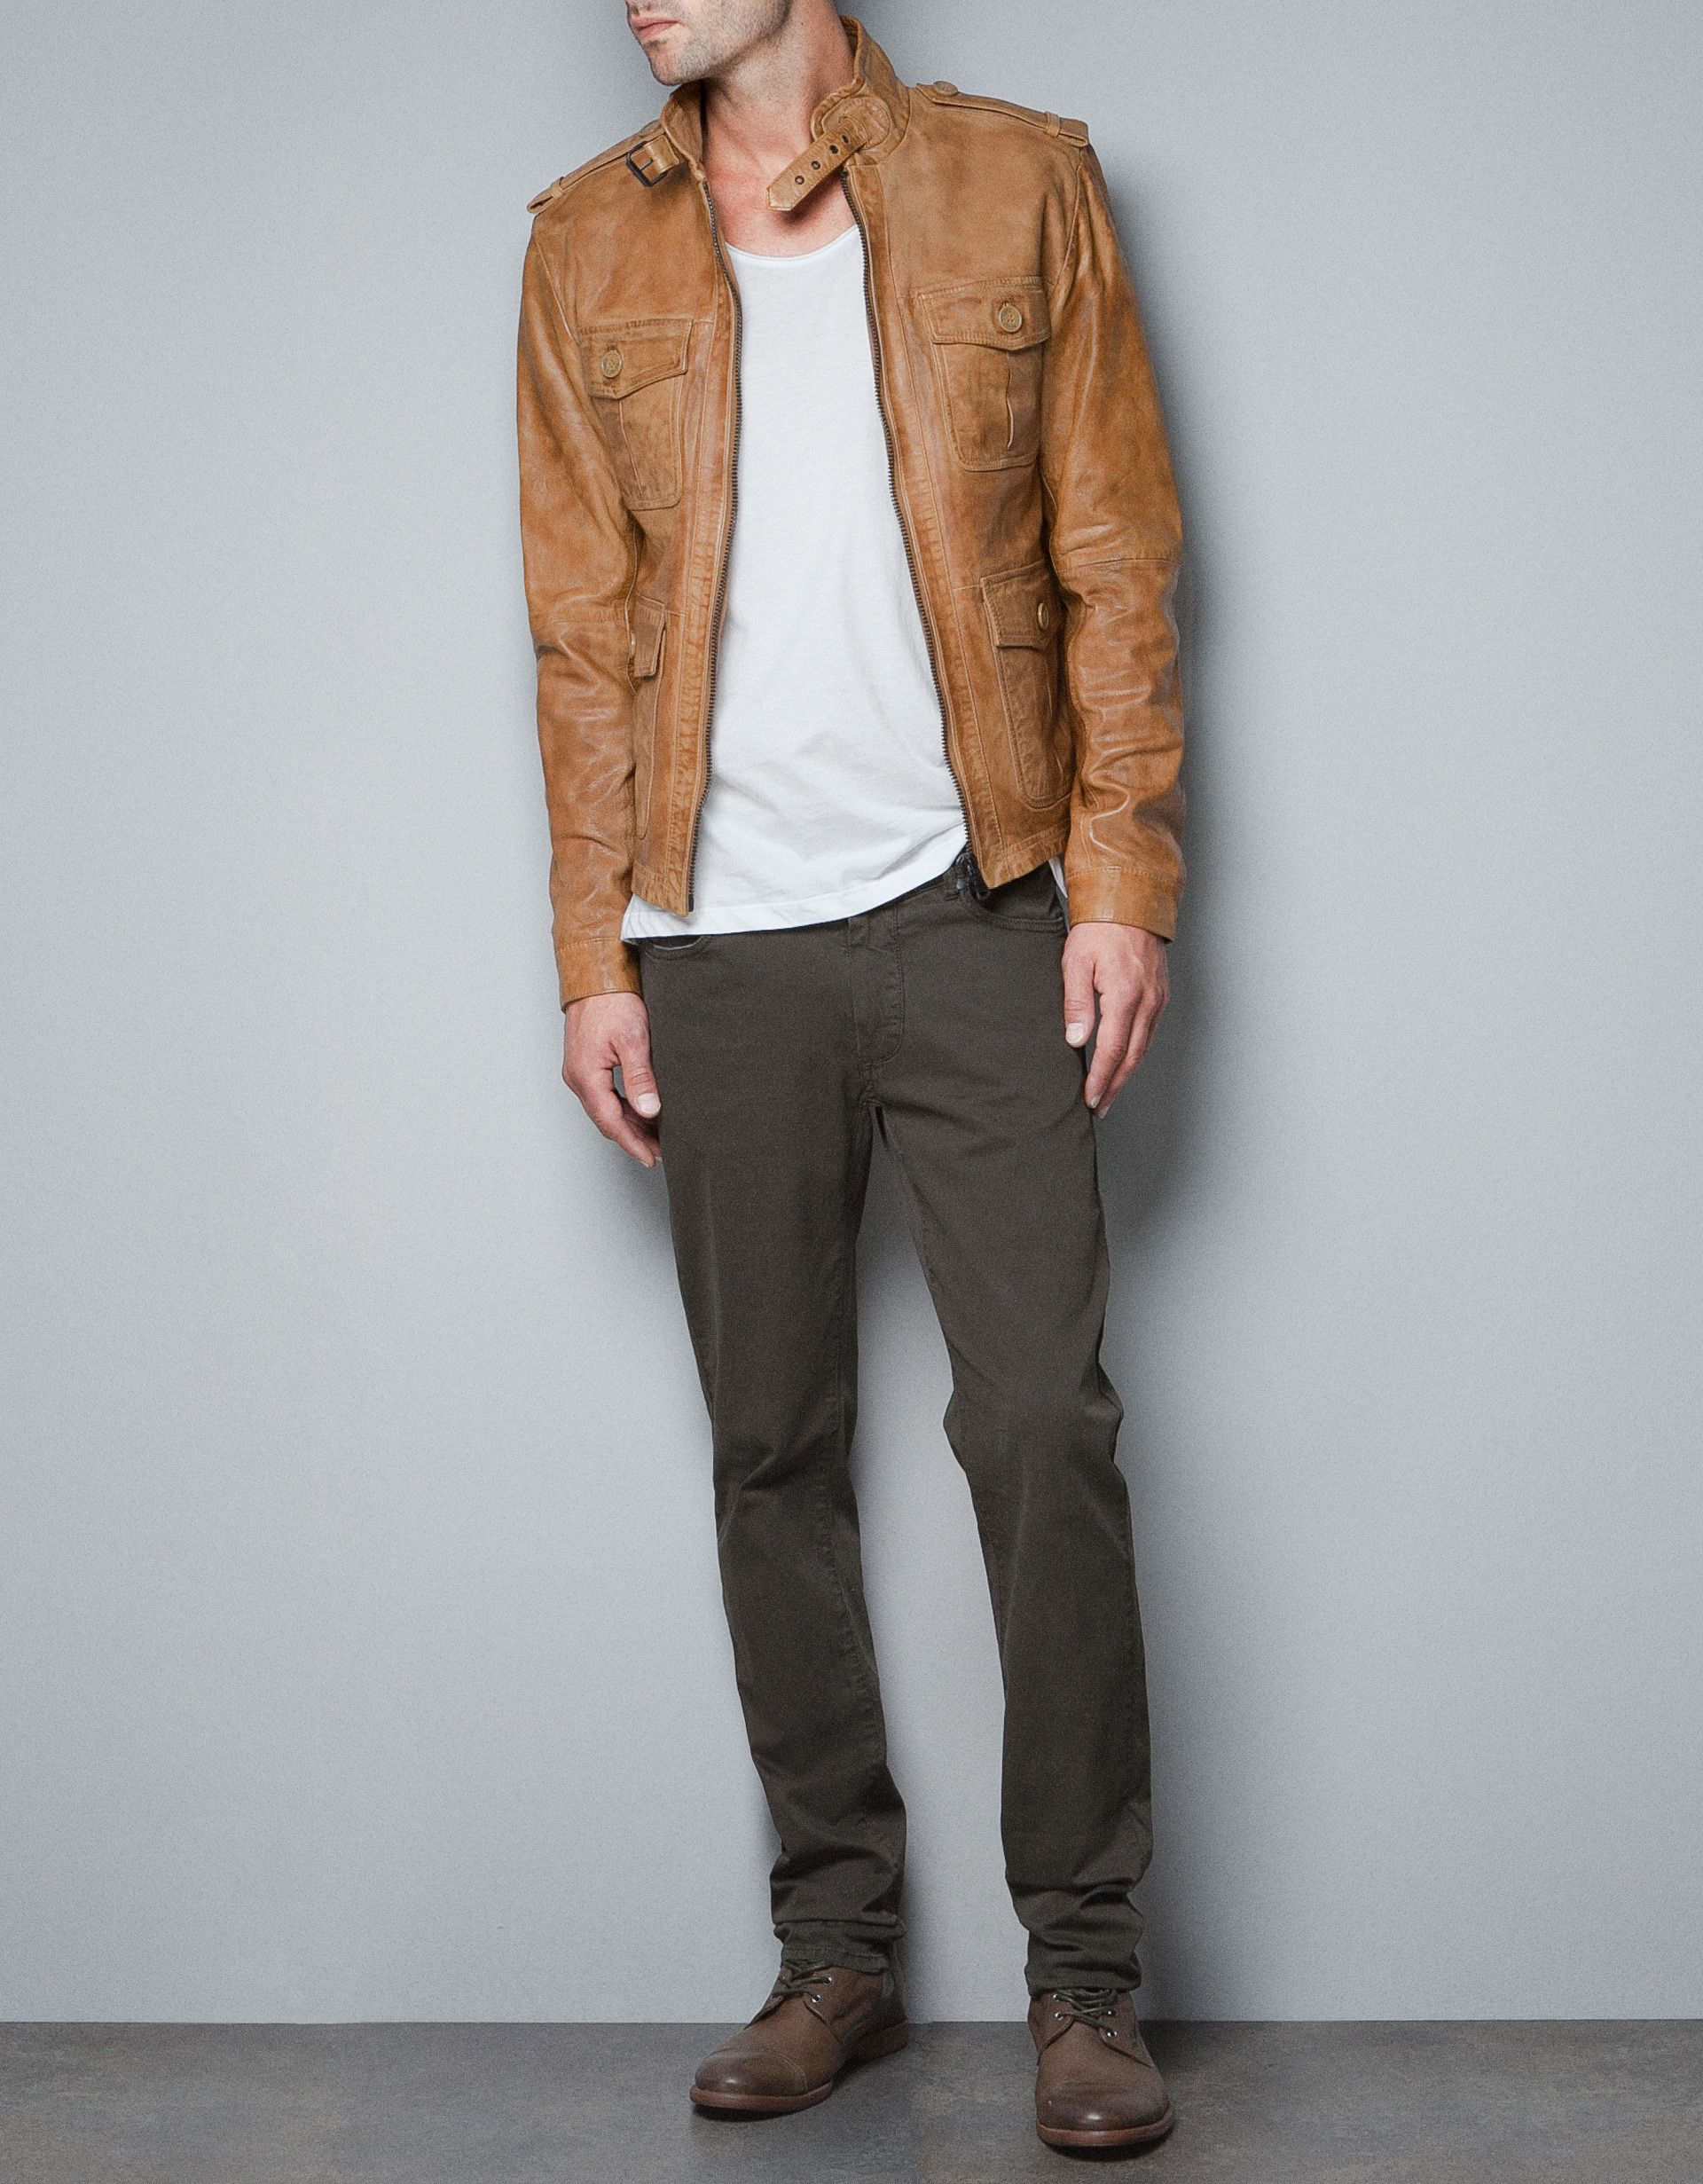 Leather Jacket Cloth Brown Leather Jacket Men Stylish Jackets